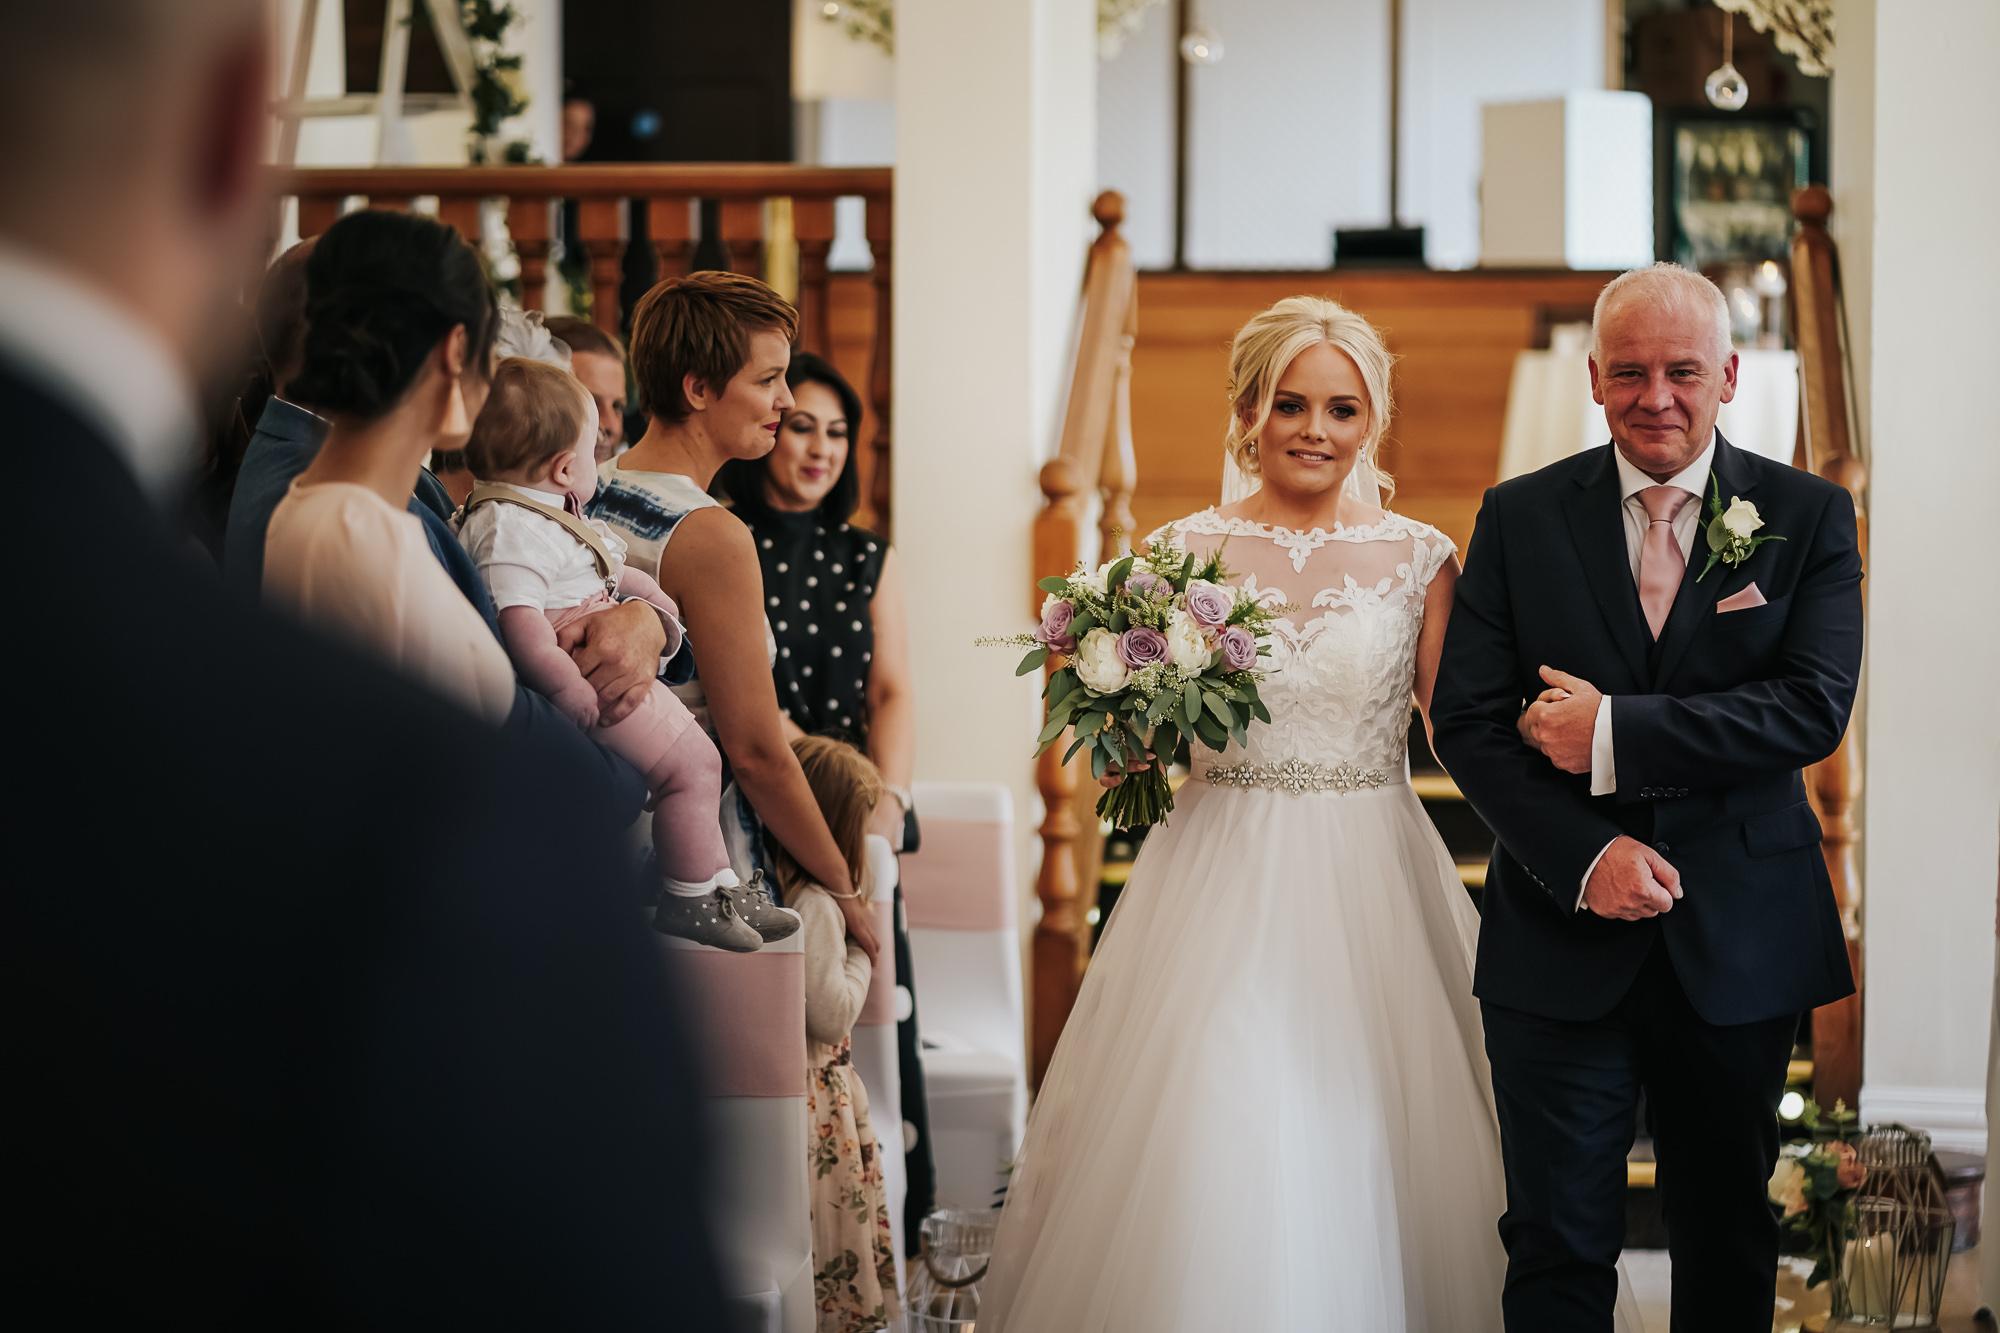 West Tower Wedding Photographer Ormskirk Lancashire wedding photography (22 of 57).jpg